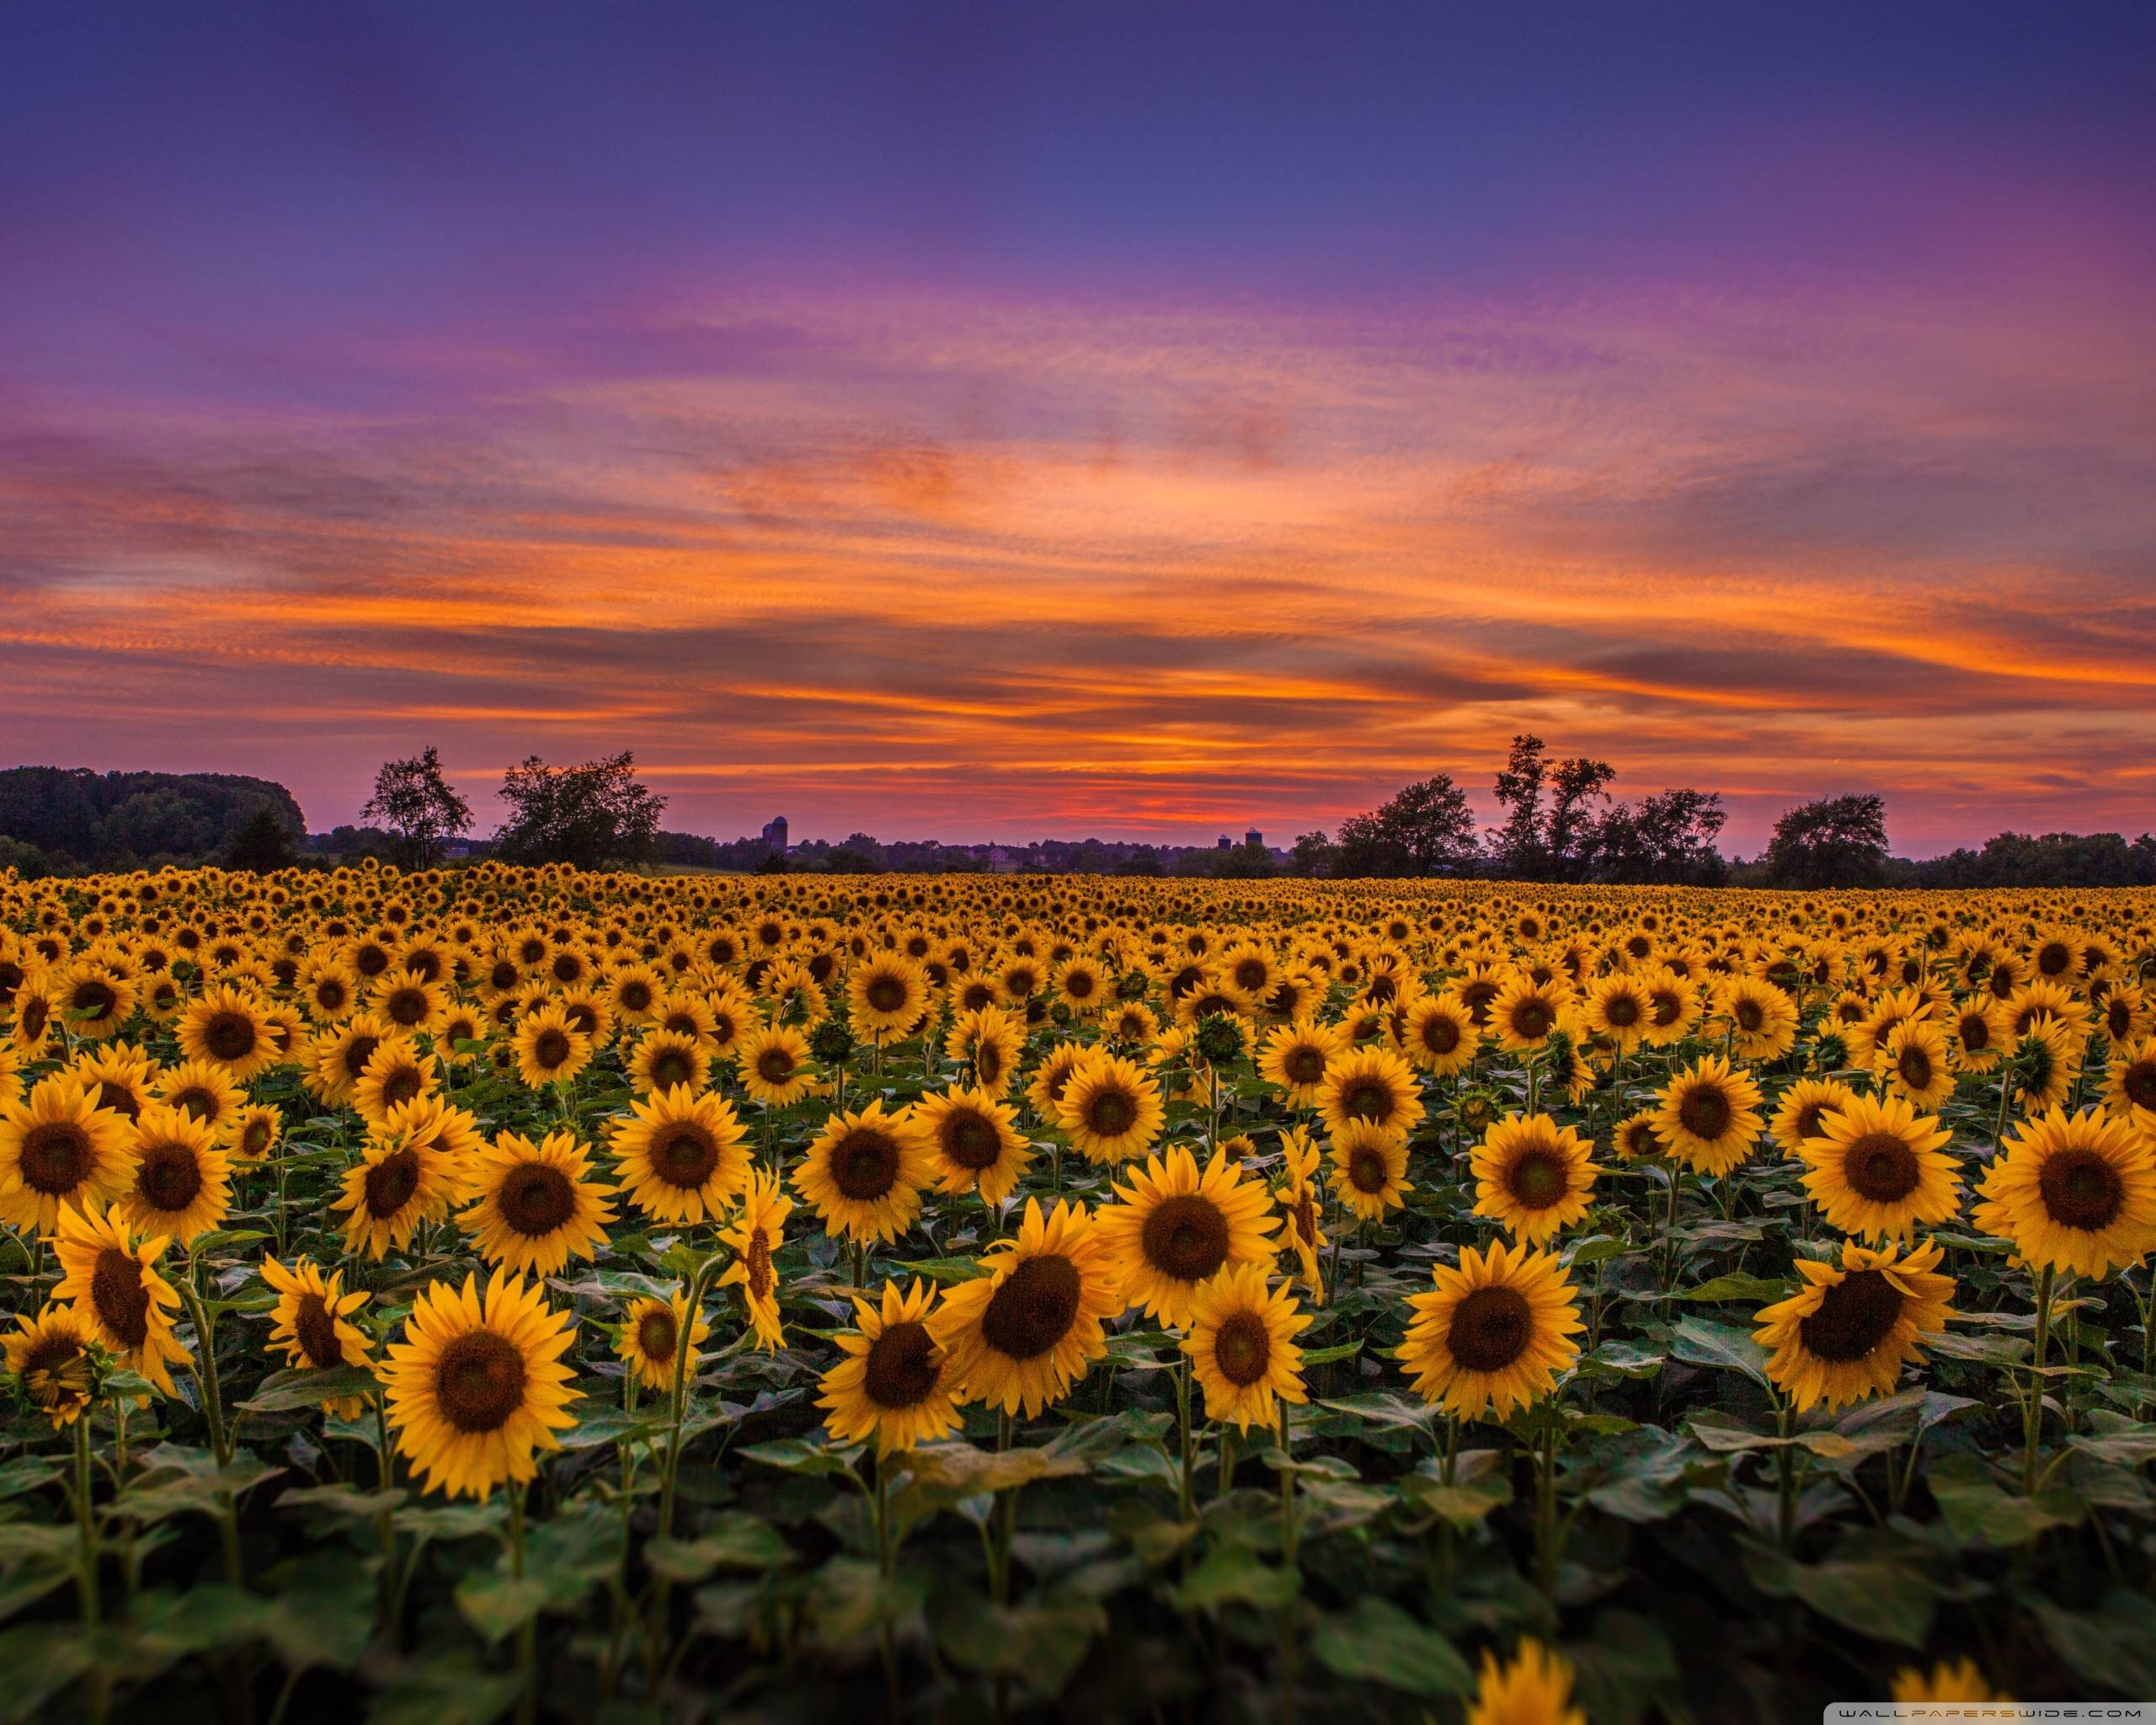 Sunflower Field Iphone Wallpapers 4k Hd Sunflower Field Iphone Backgrounds On Wallpaperbat